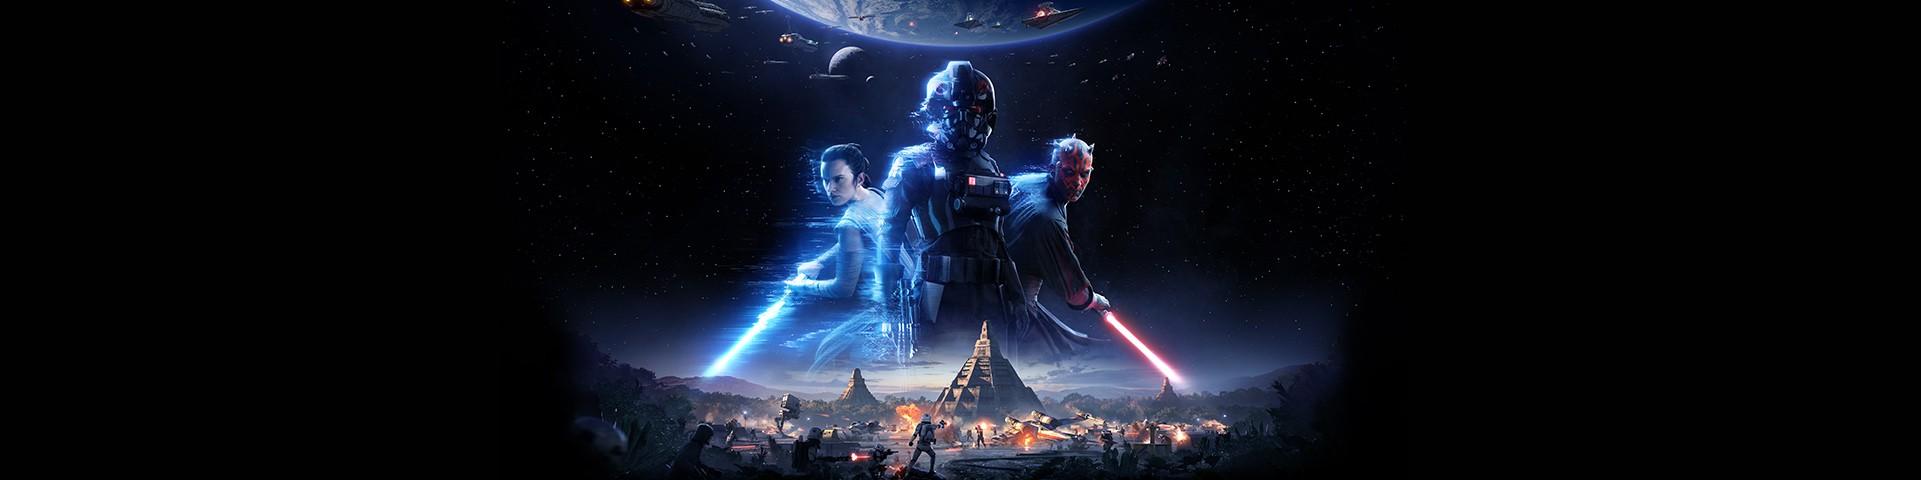 STAR WARS™ Battlefront™ II for PC | Origin